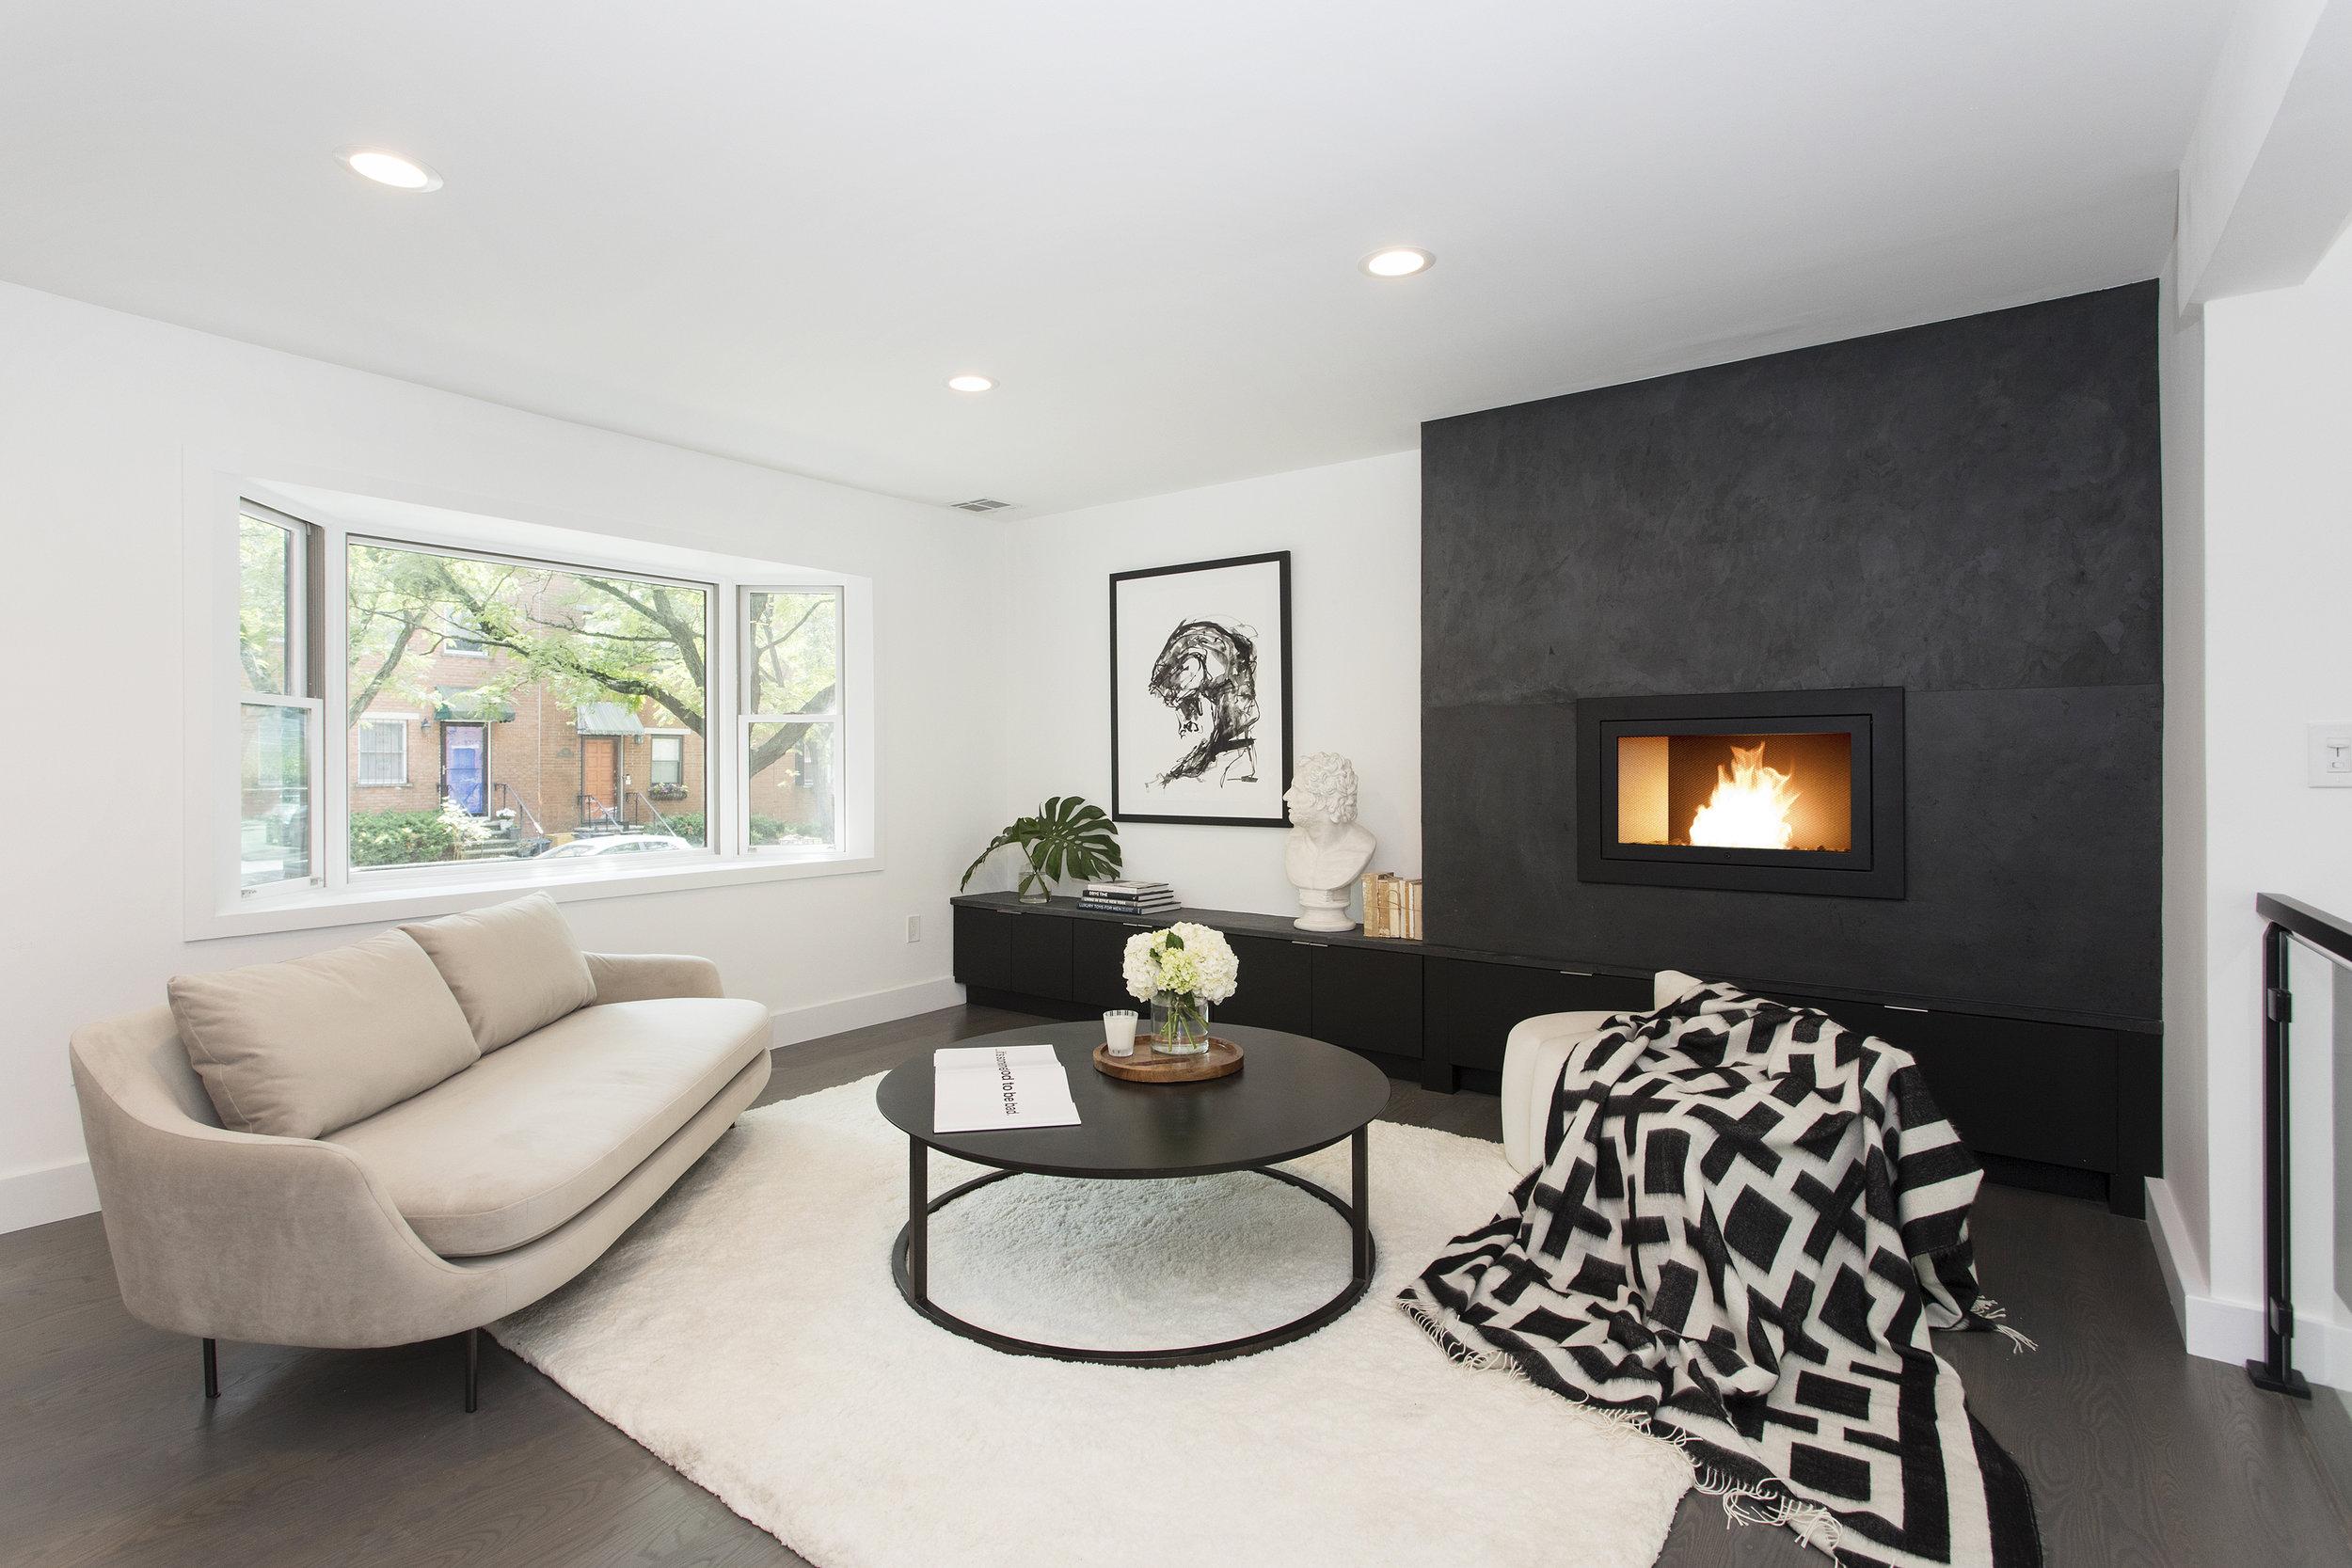 Marina Cheban Design - Brenner Residence 1-edit.jpg